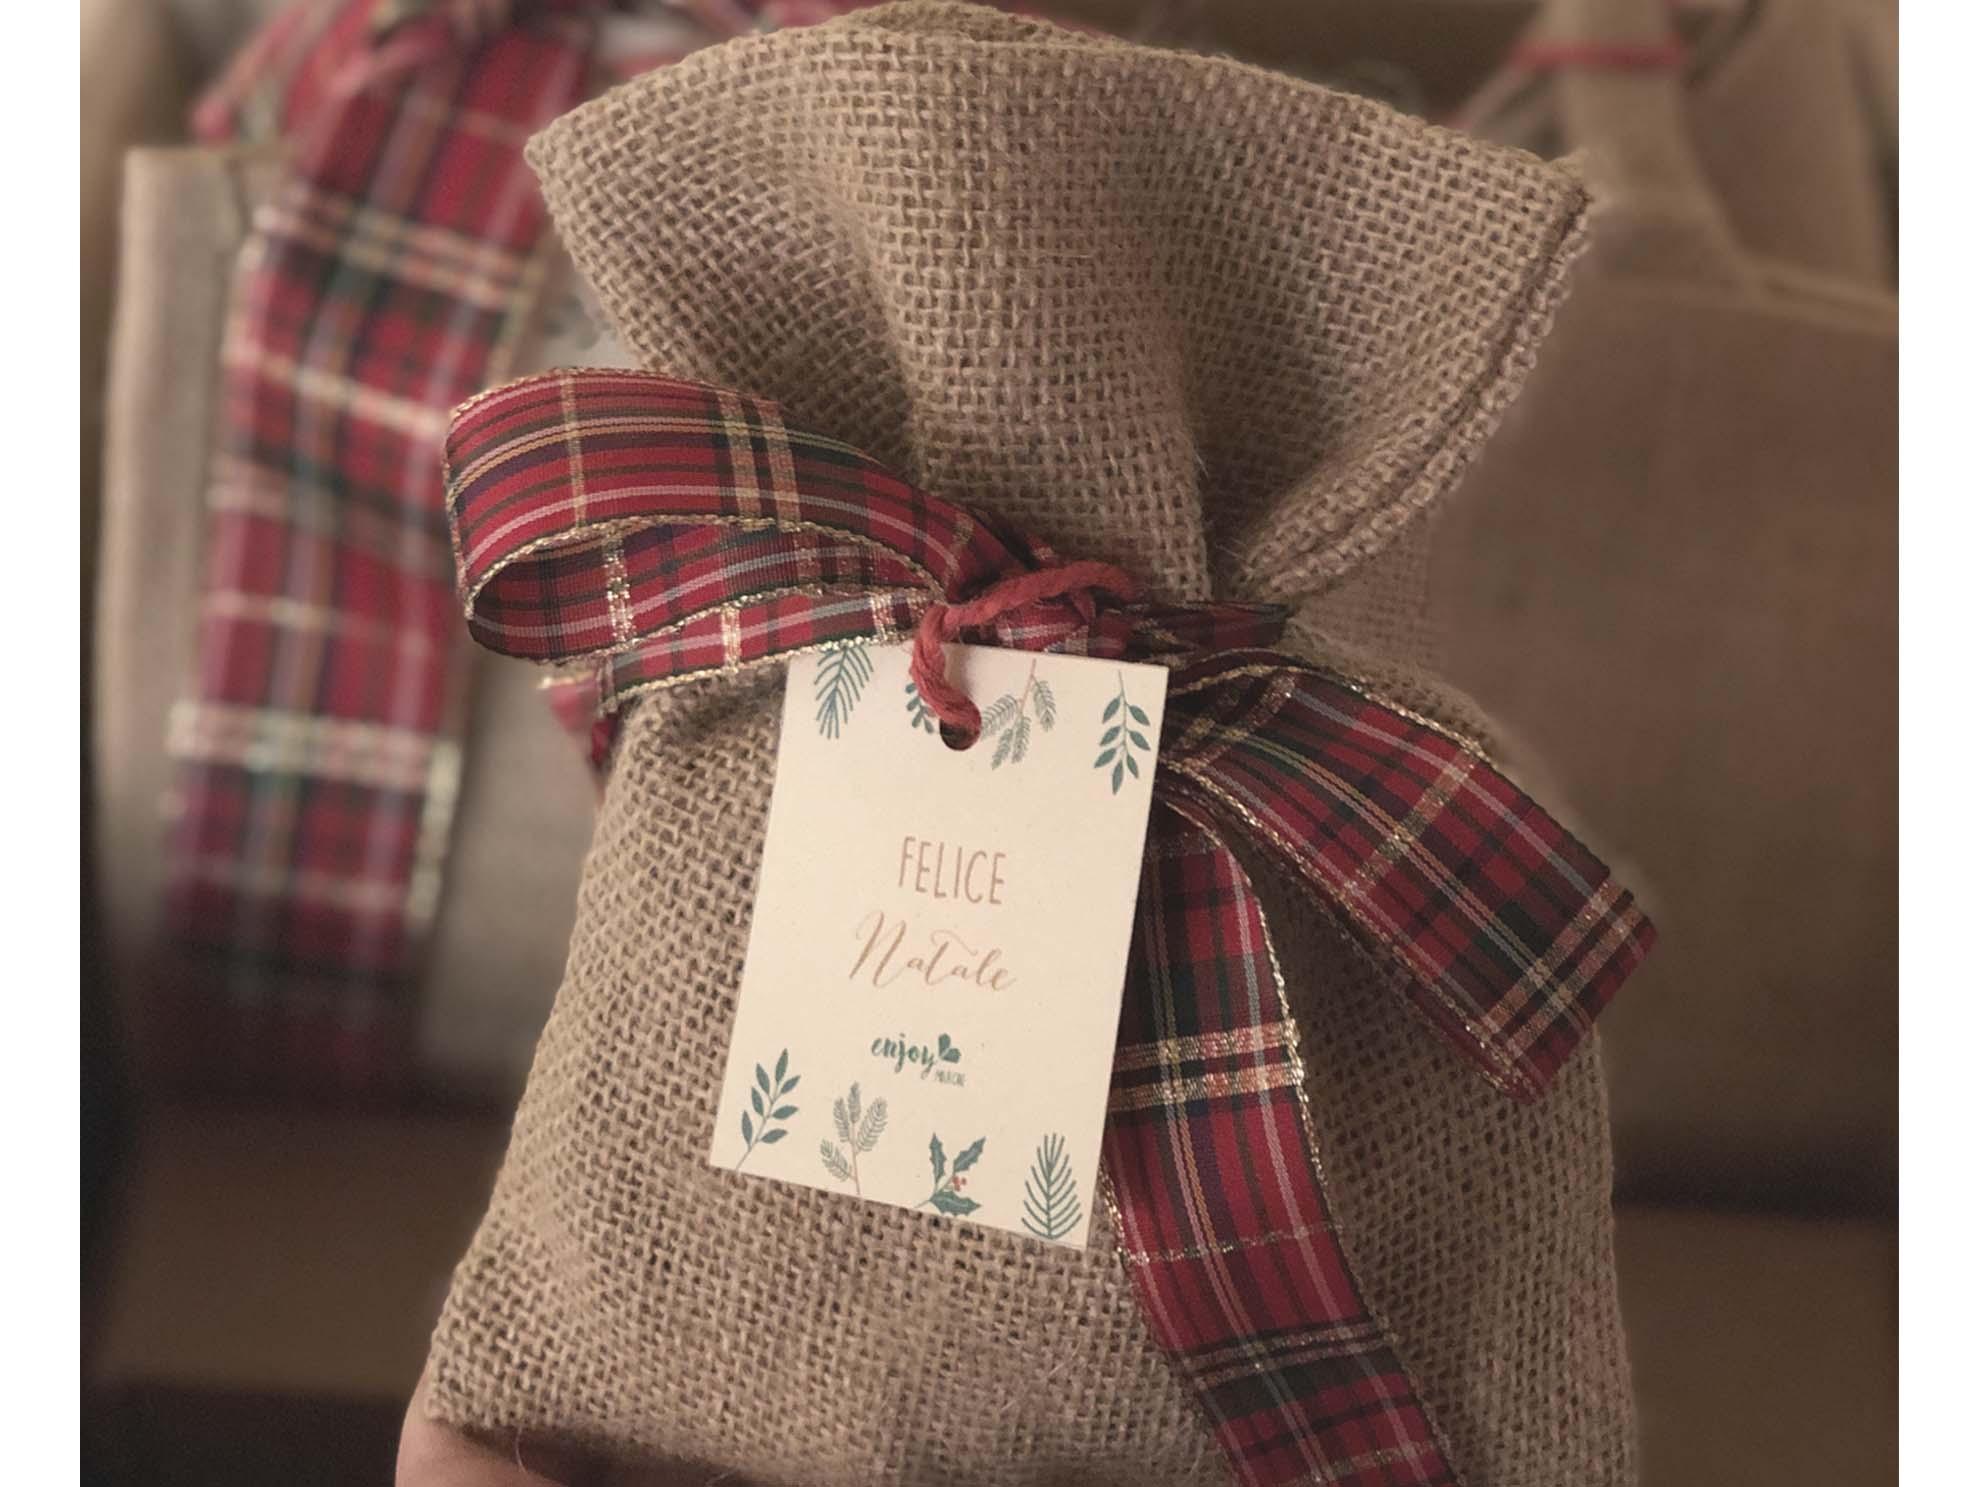 Immagine 5 Gift ideas